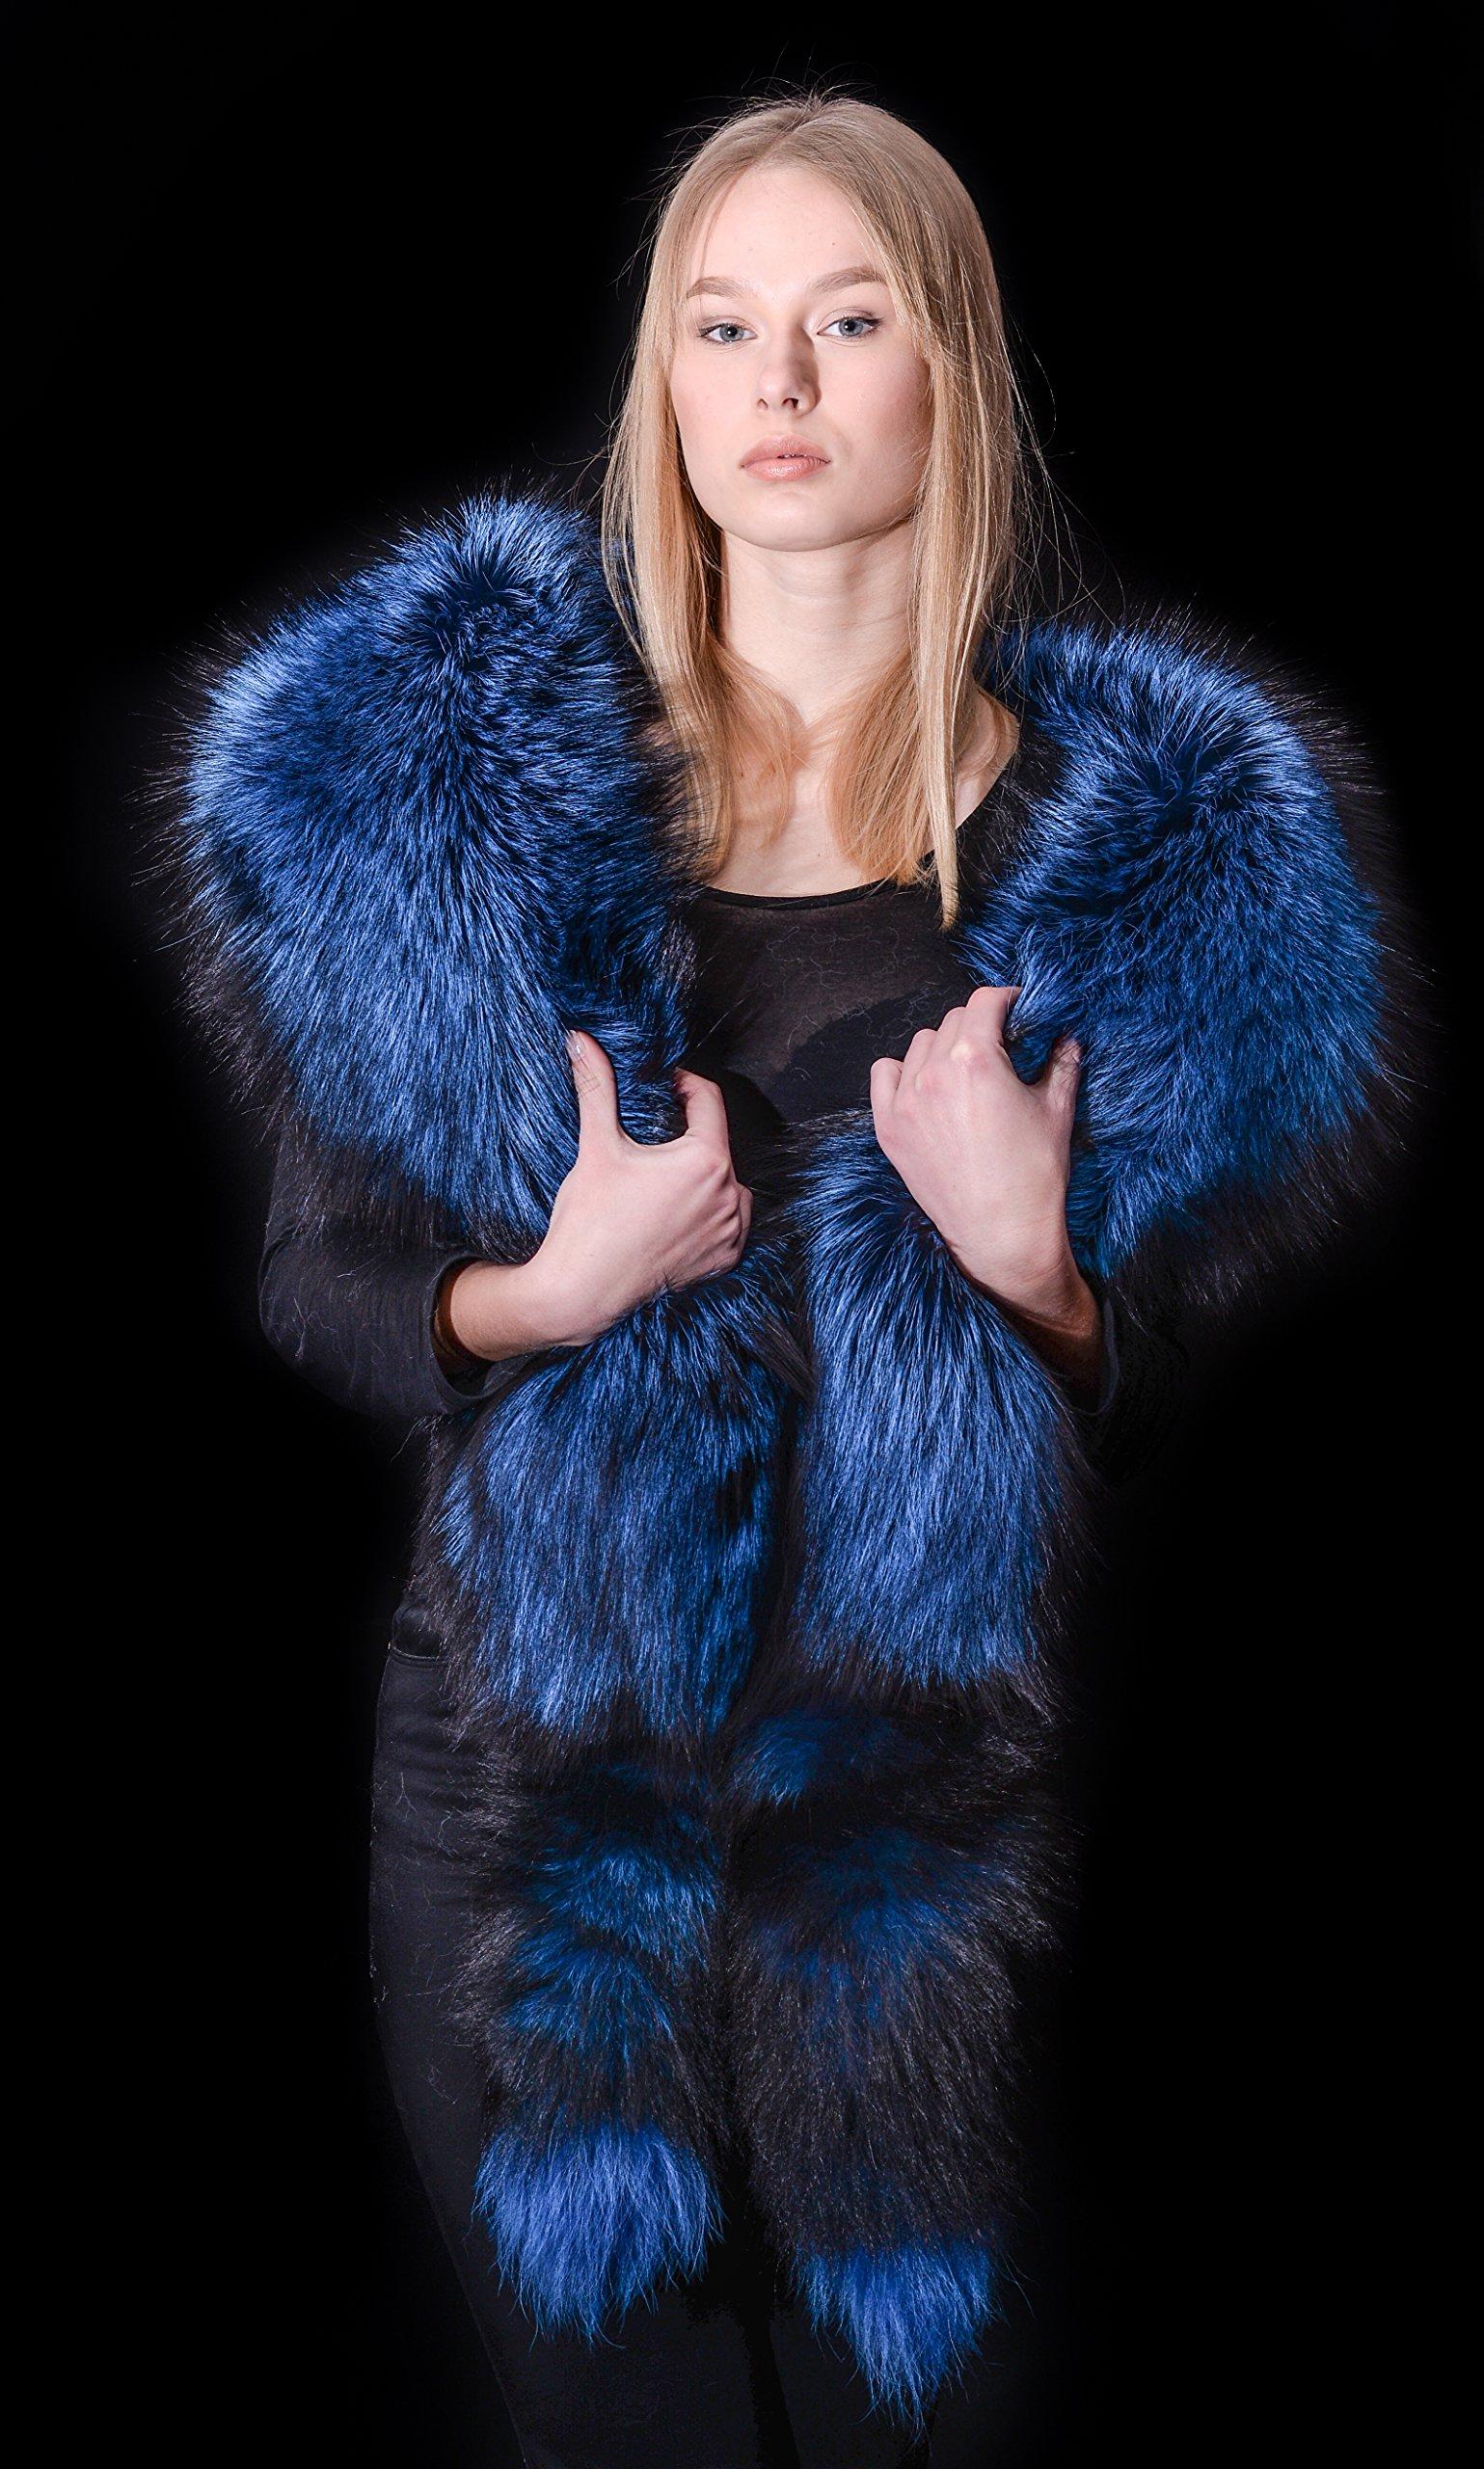 Cobalt Blue Silver Fox Fur Handmade Boa Stole Shawl + Tails